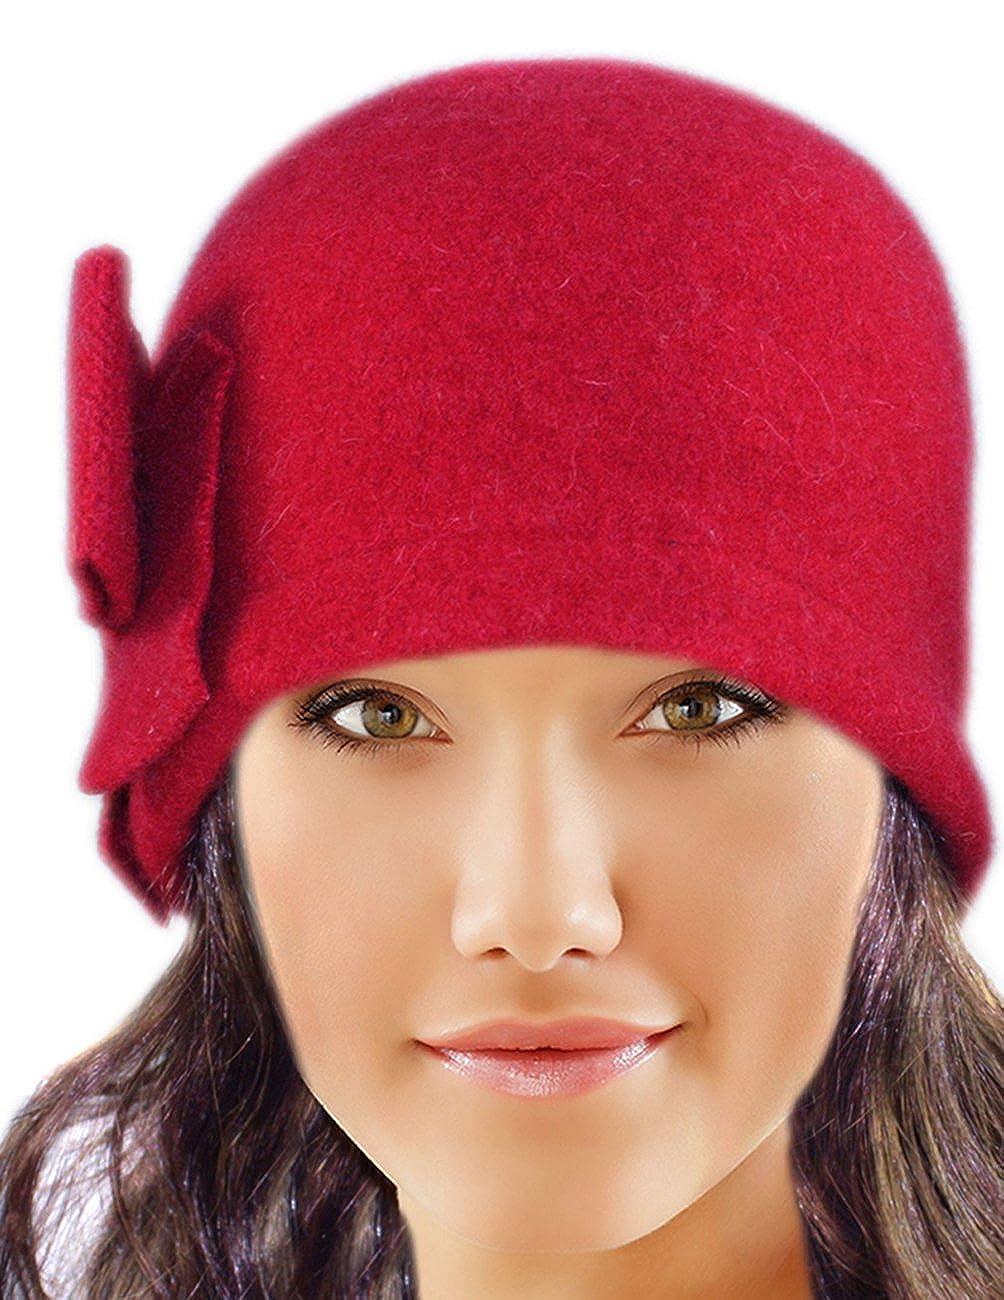 00e7c9e208ad5 Dahlia Women s Daisy Flower Wool Cloche Bucket Hat HT0014WLW-BK larger image